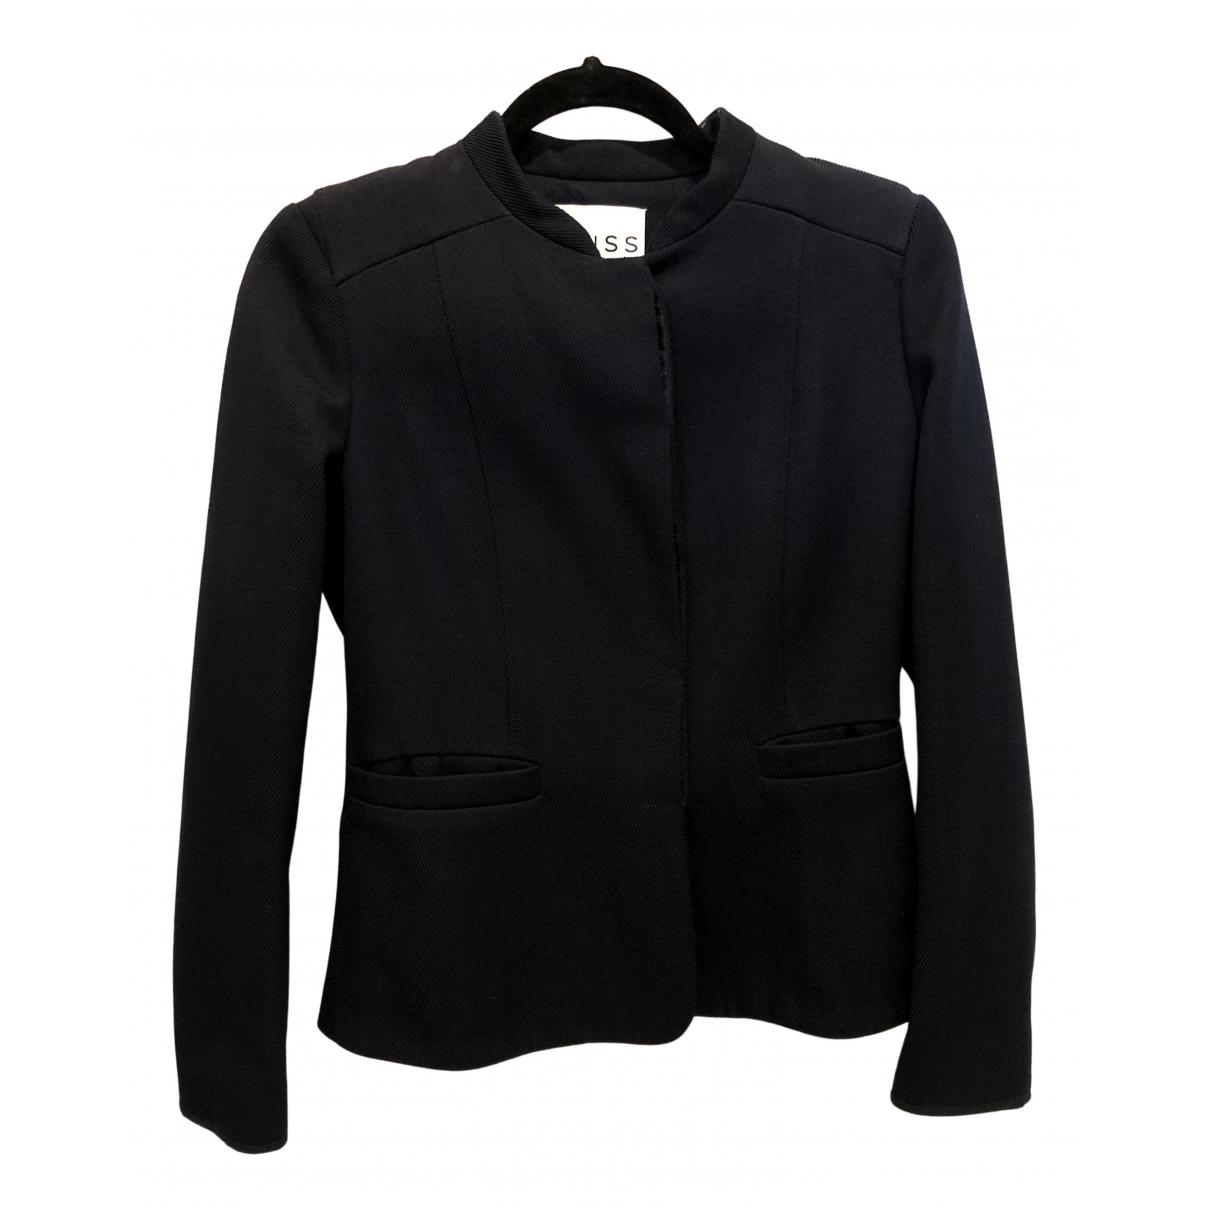 Reiss \N Navy Cotton jacket for Women XS International